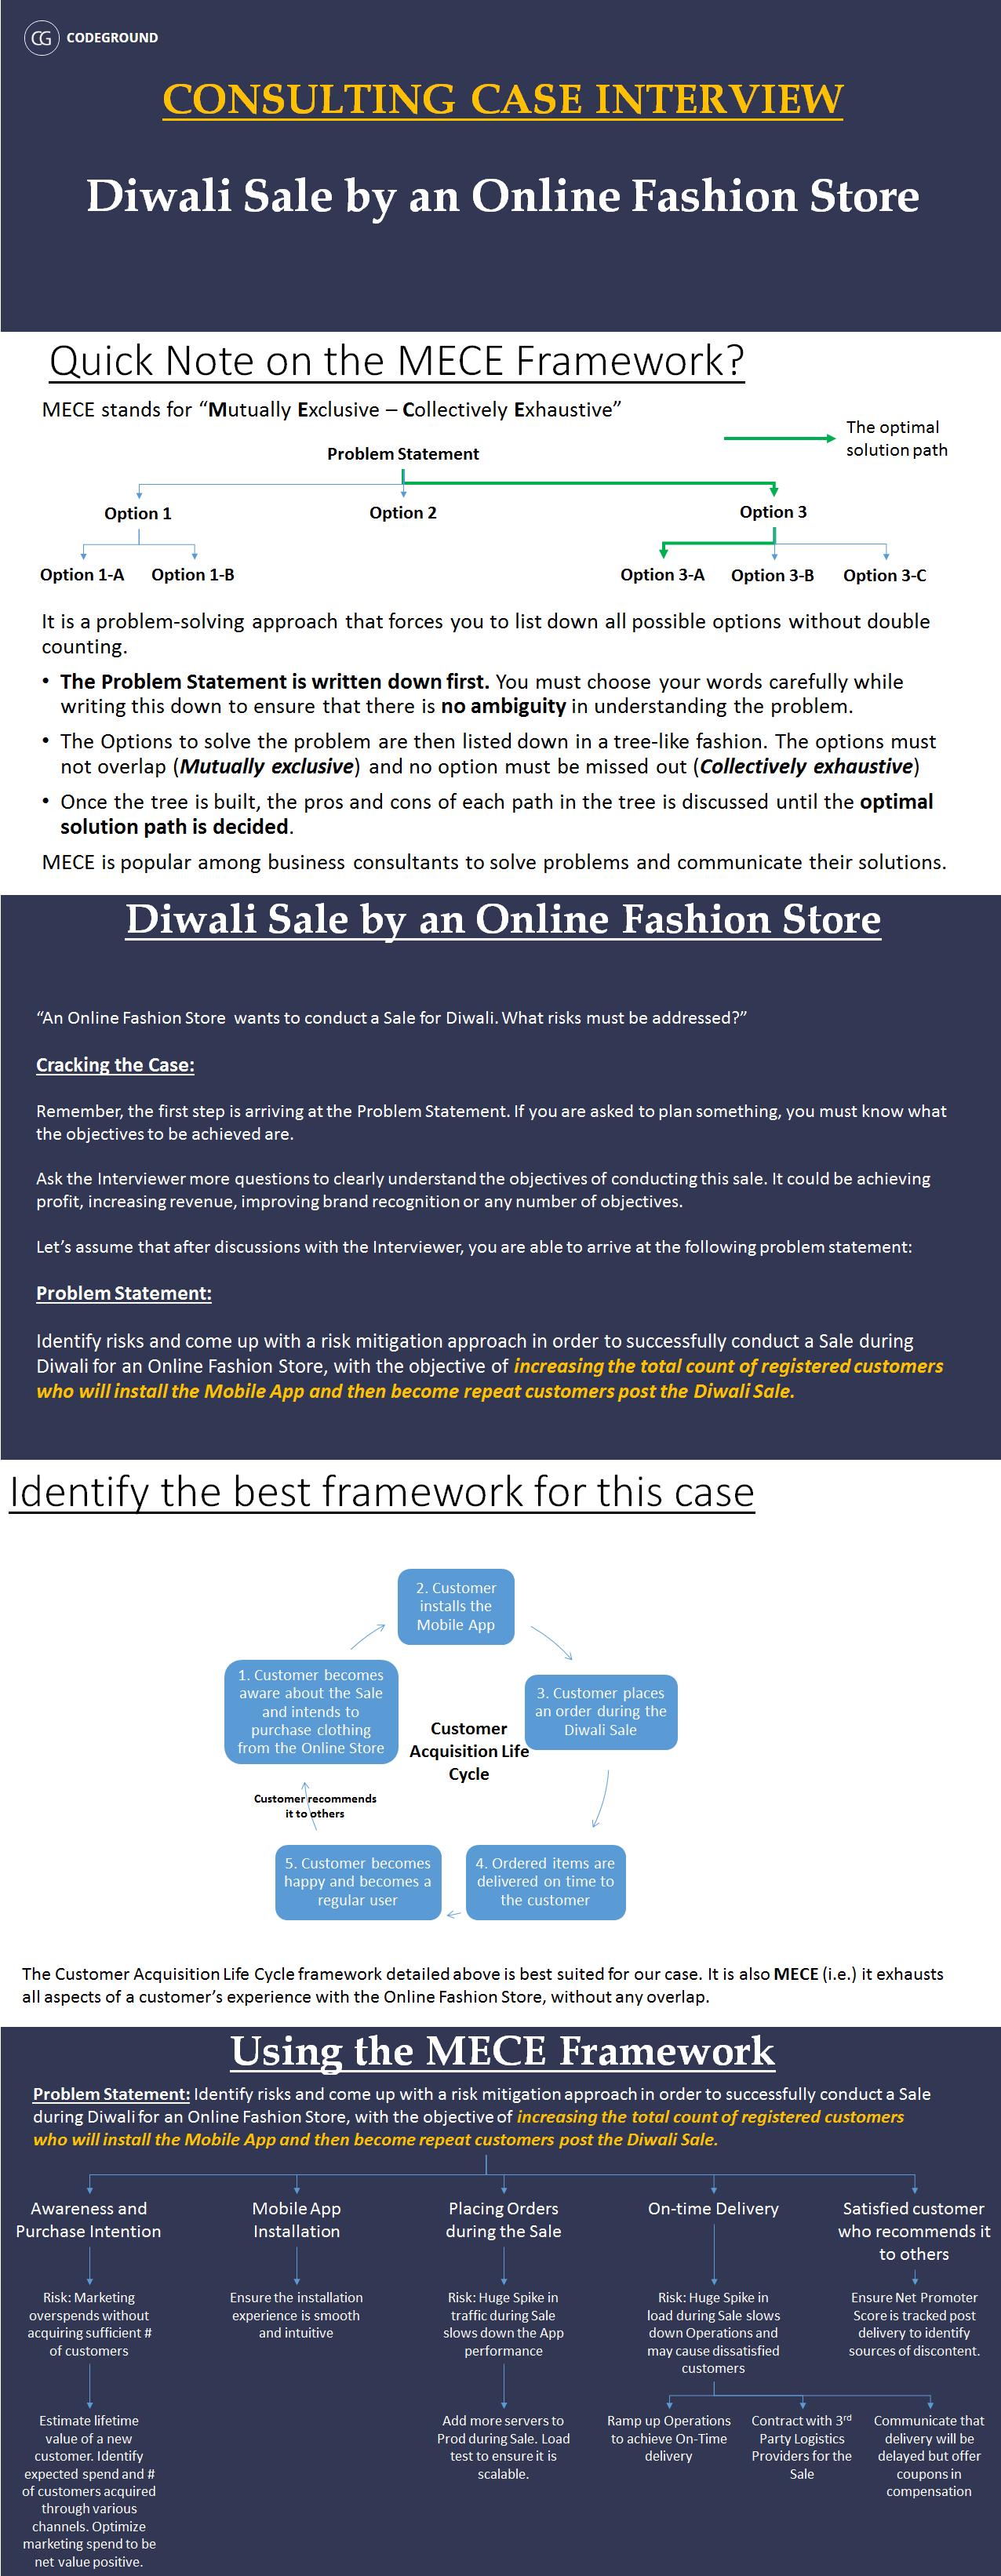 case-interview-diwali-sale-for-online-fashion-store